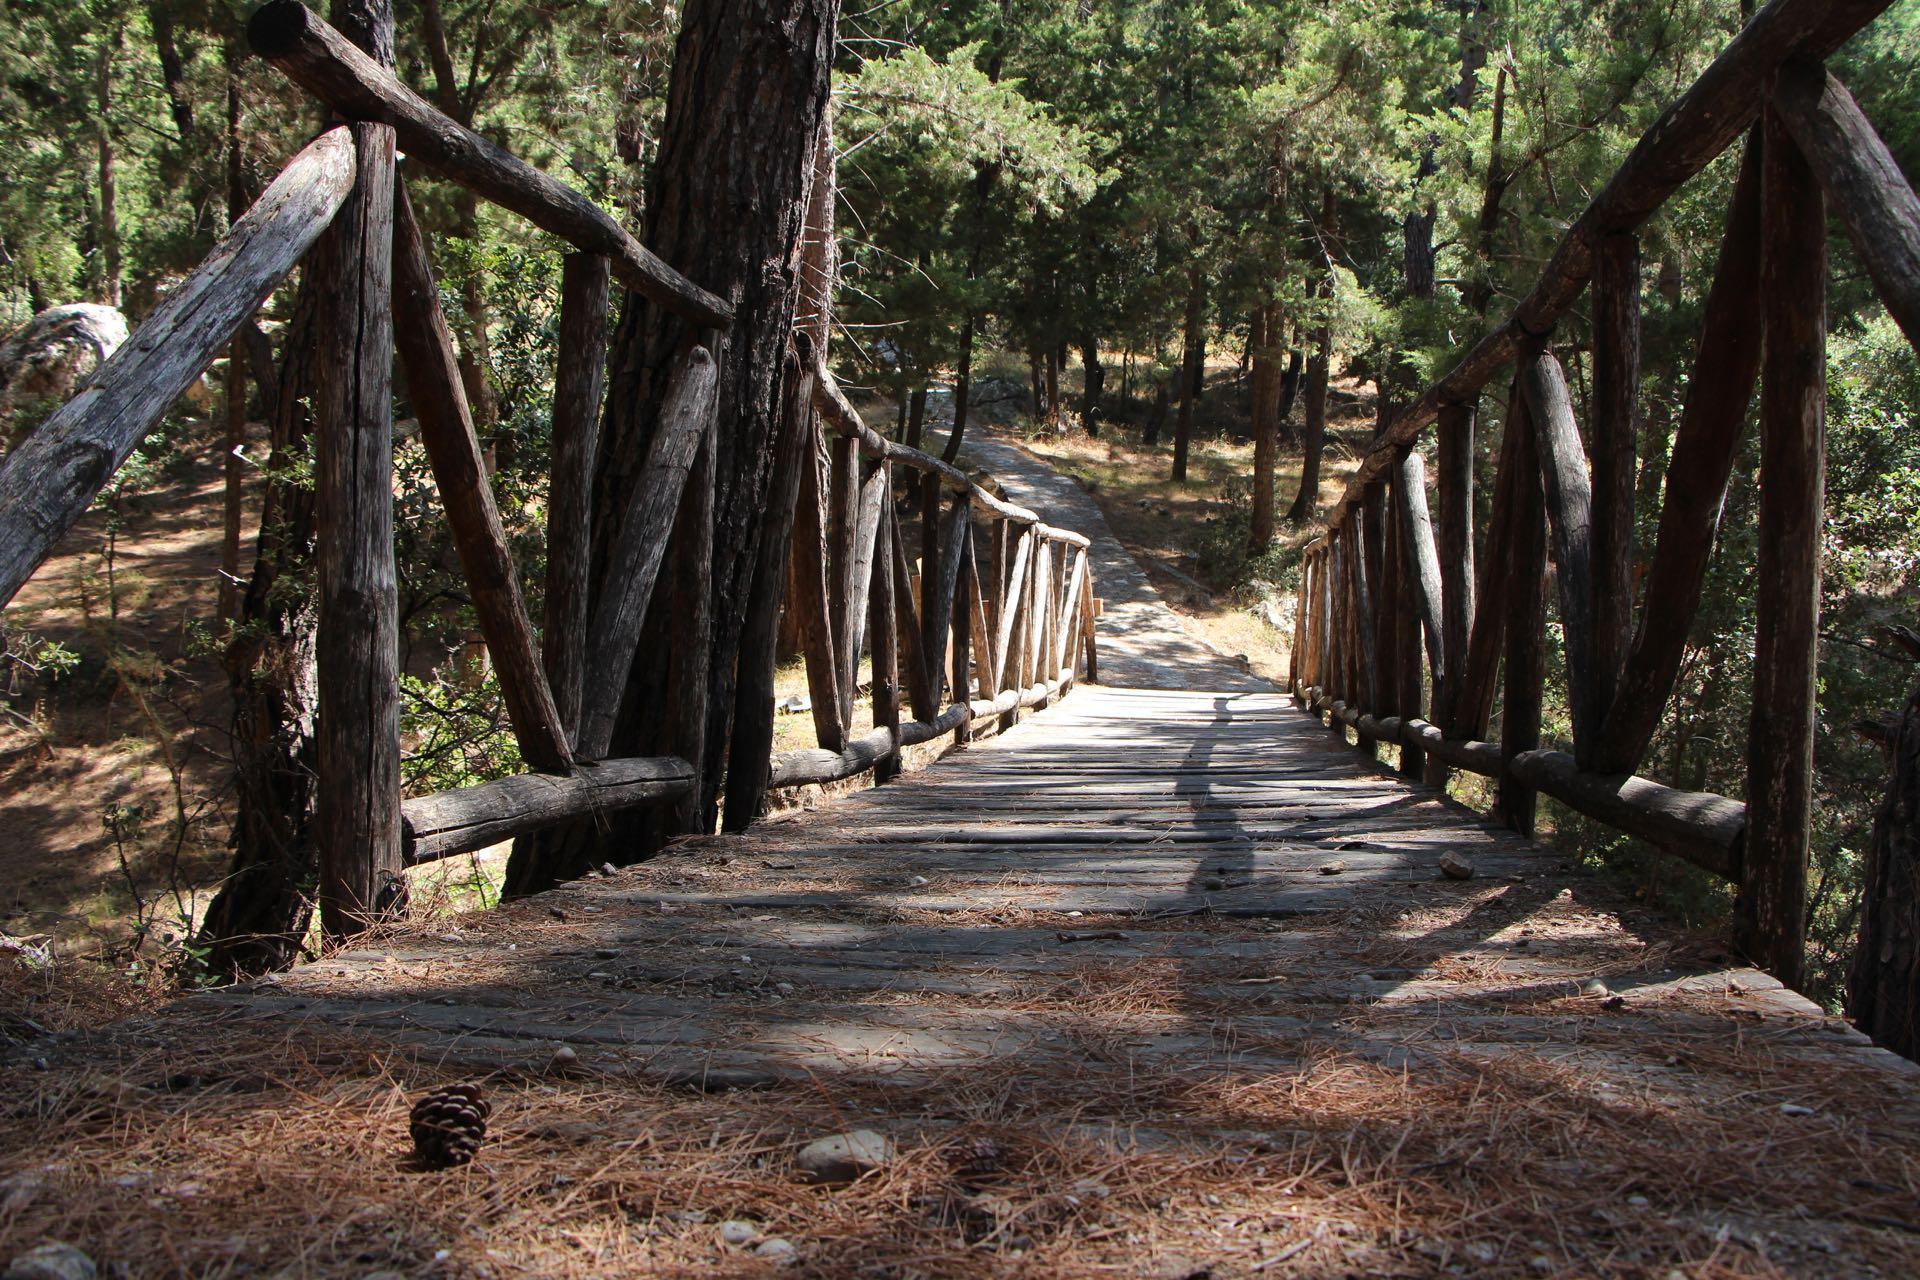 Bridge at the Koniario recreational area